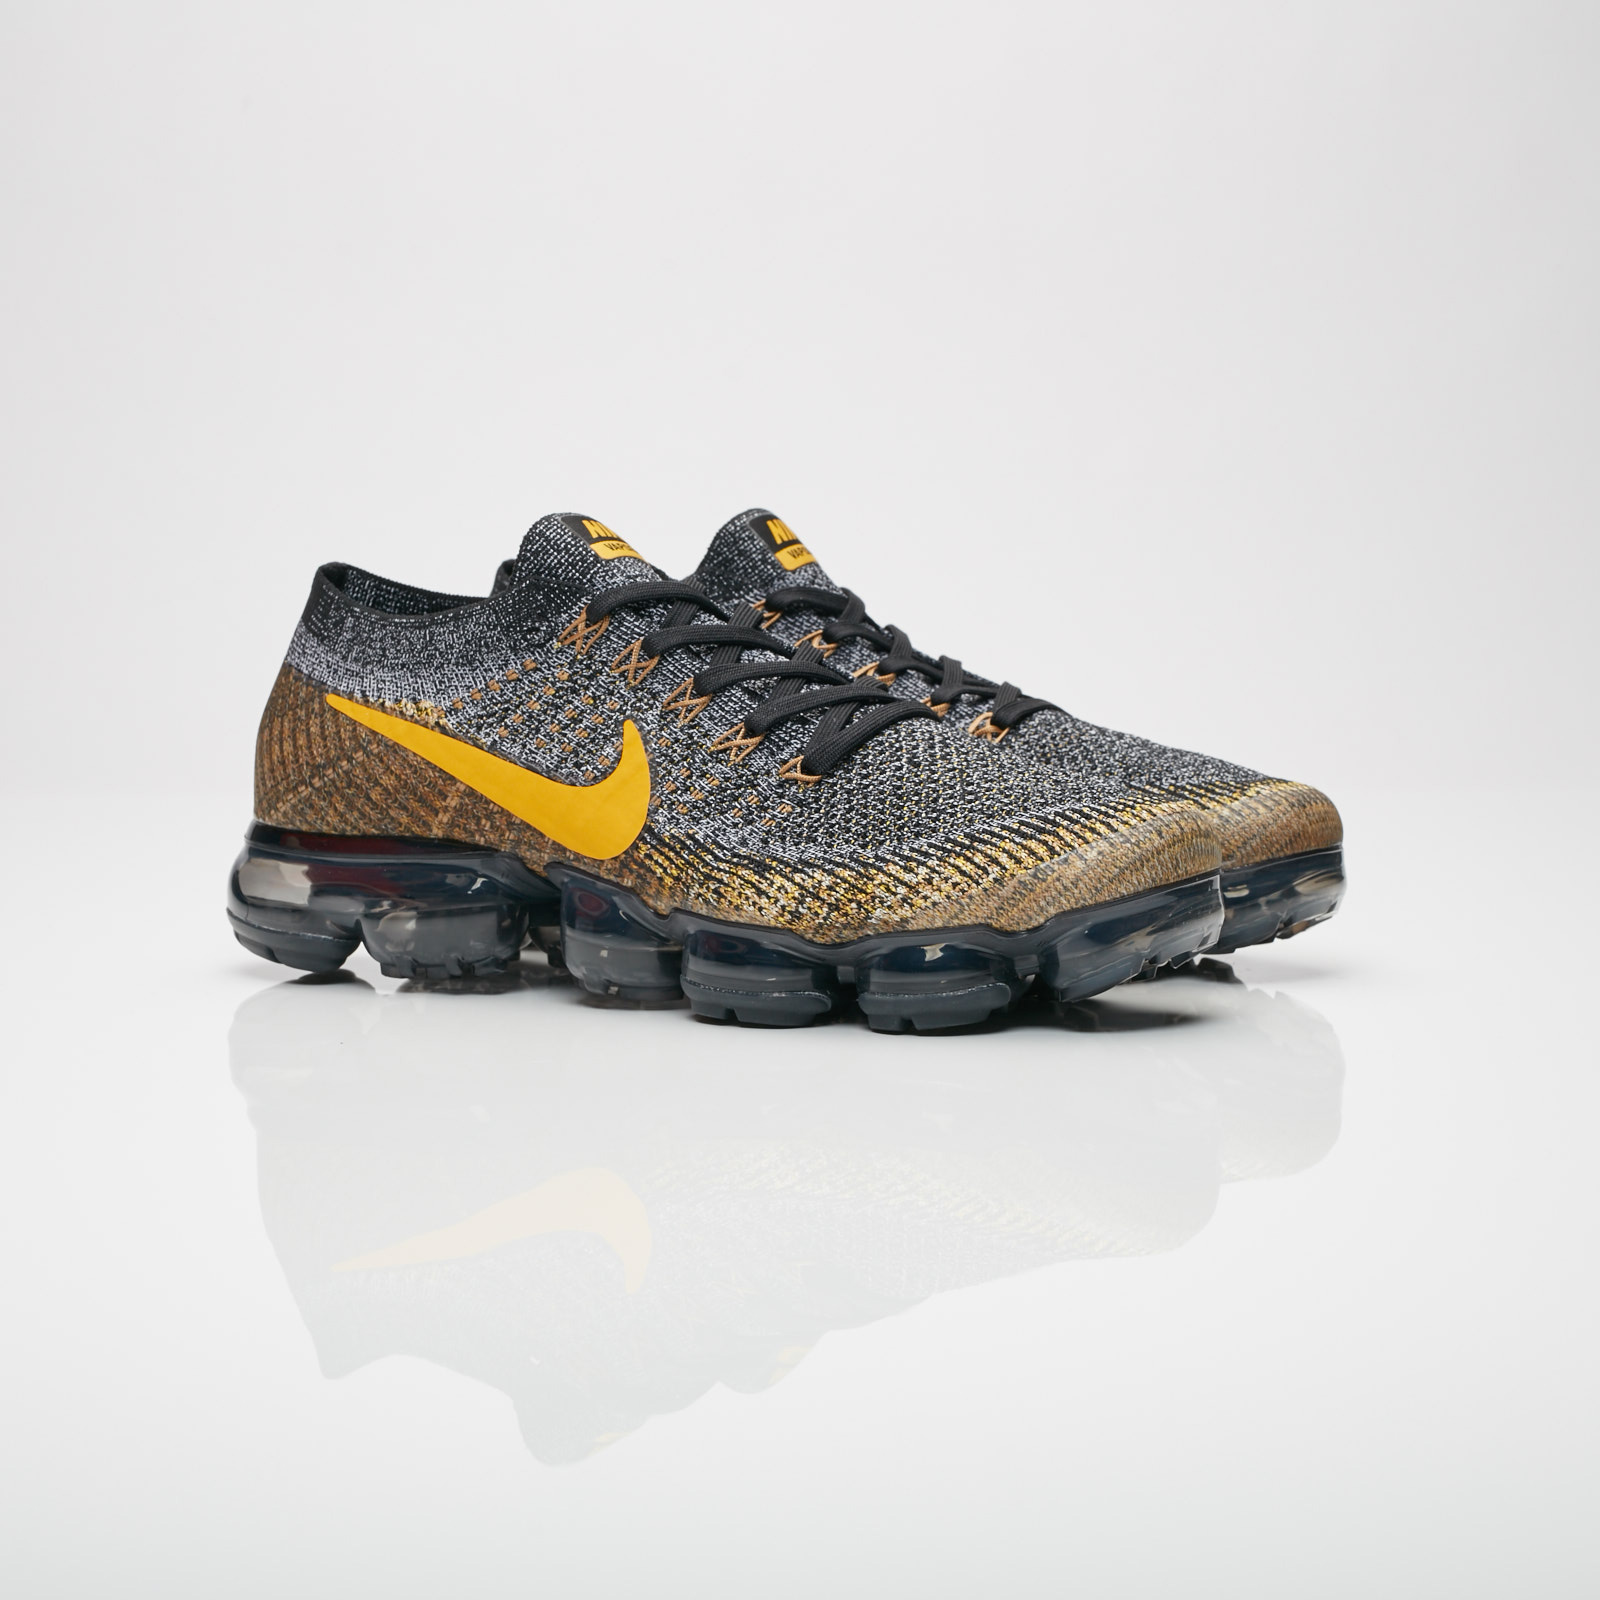 Nike Air Vapormax Flyknit - 849558-021